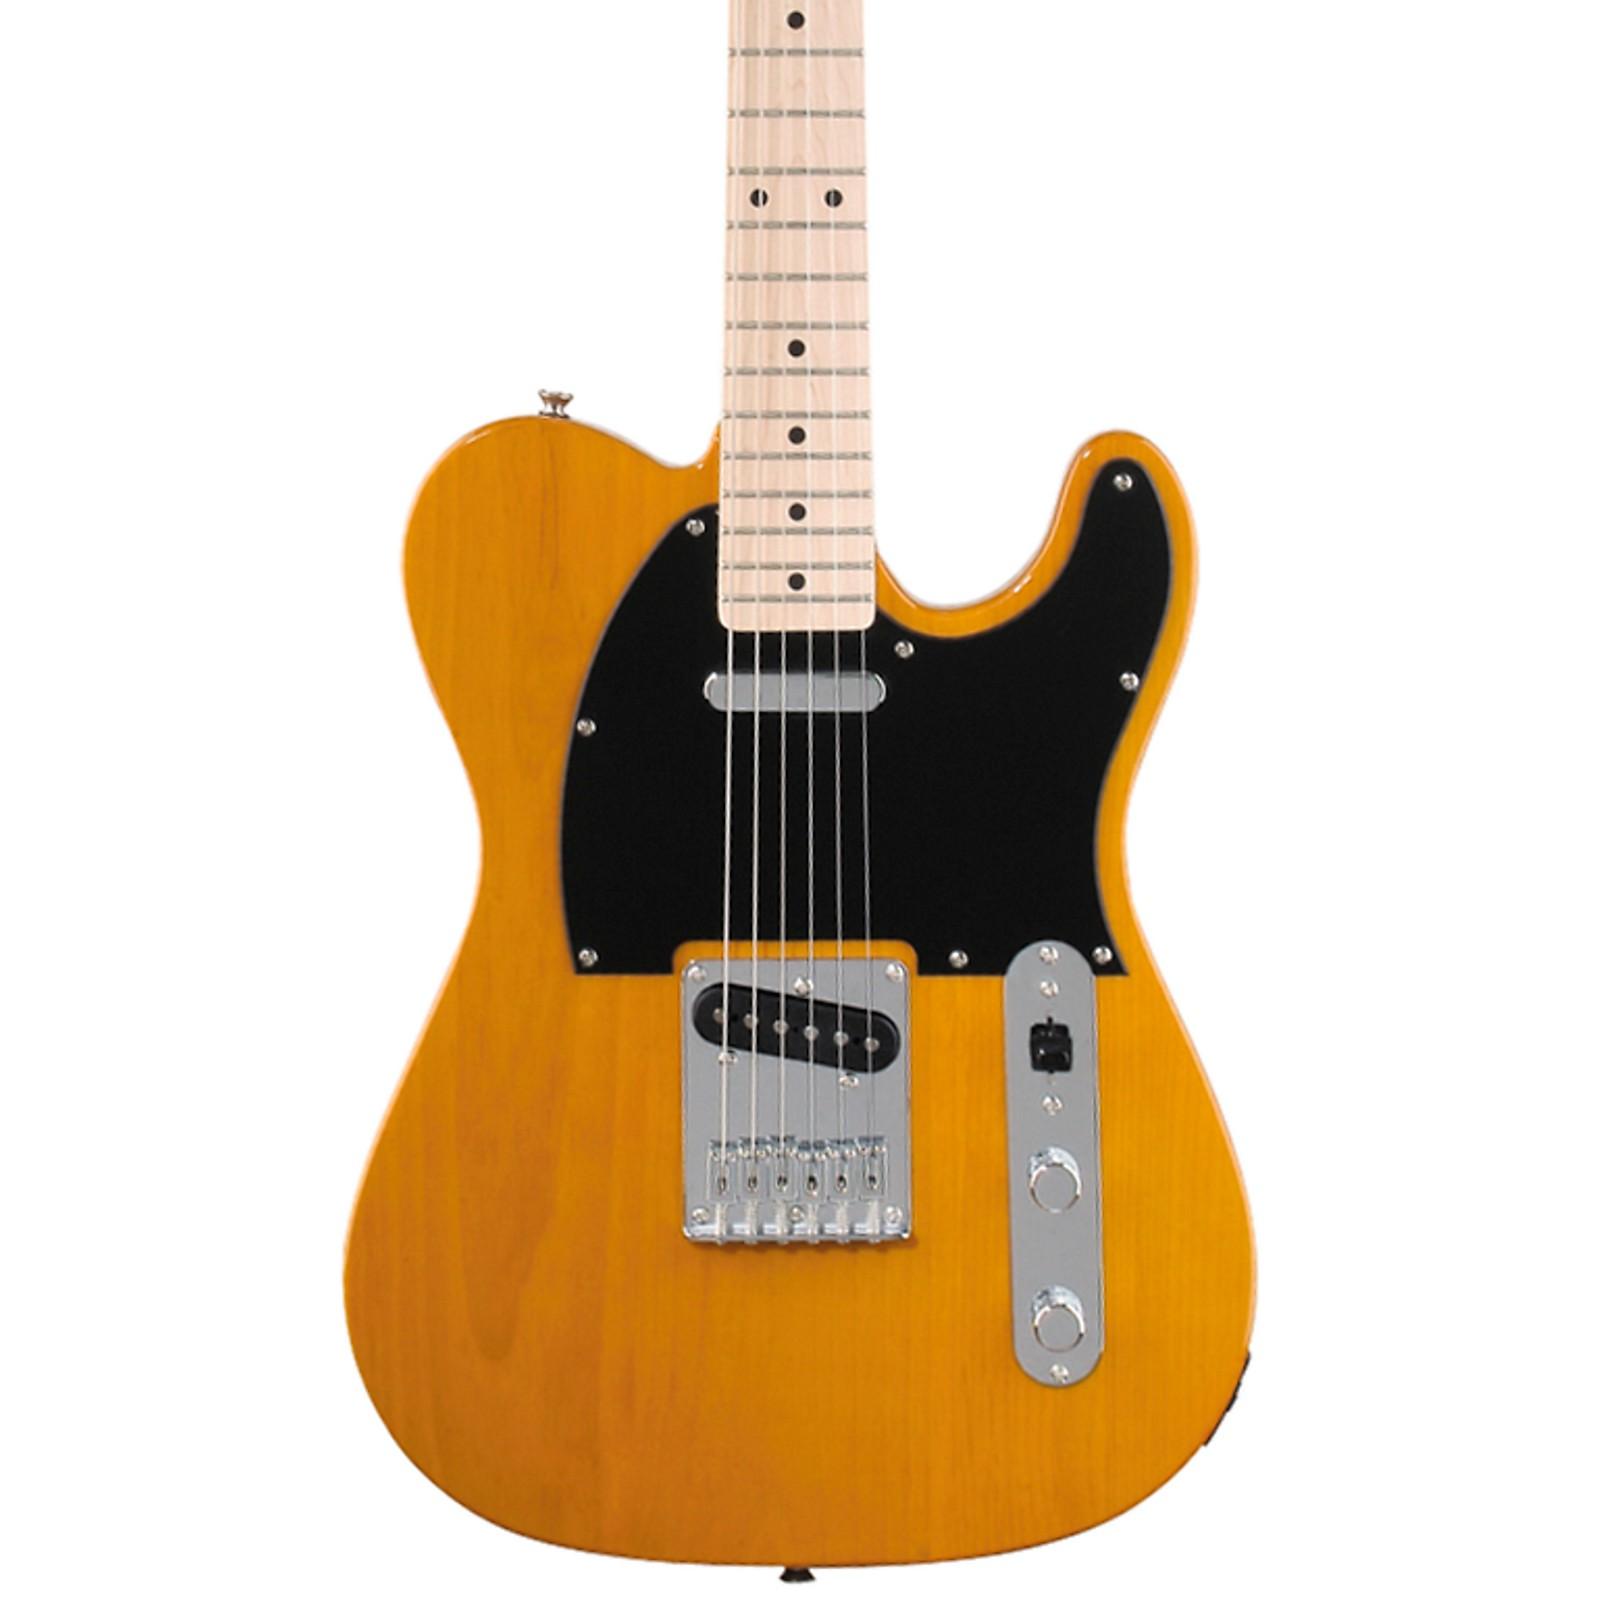 Fender Squier Affinity Series Telecaster MN Black